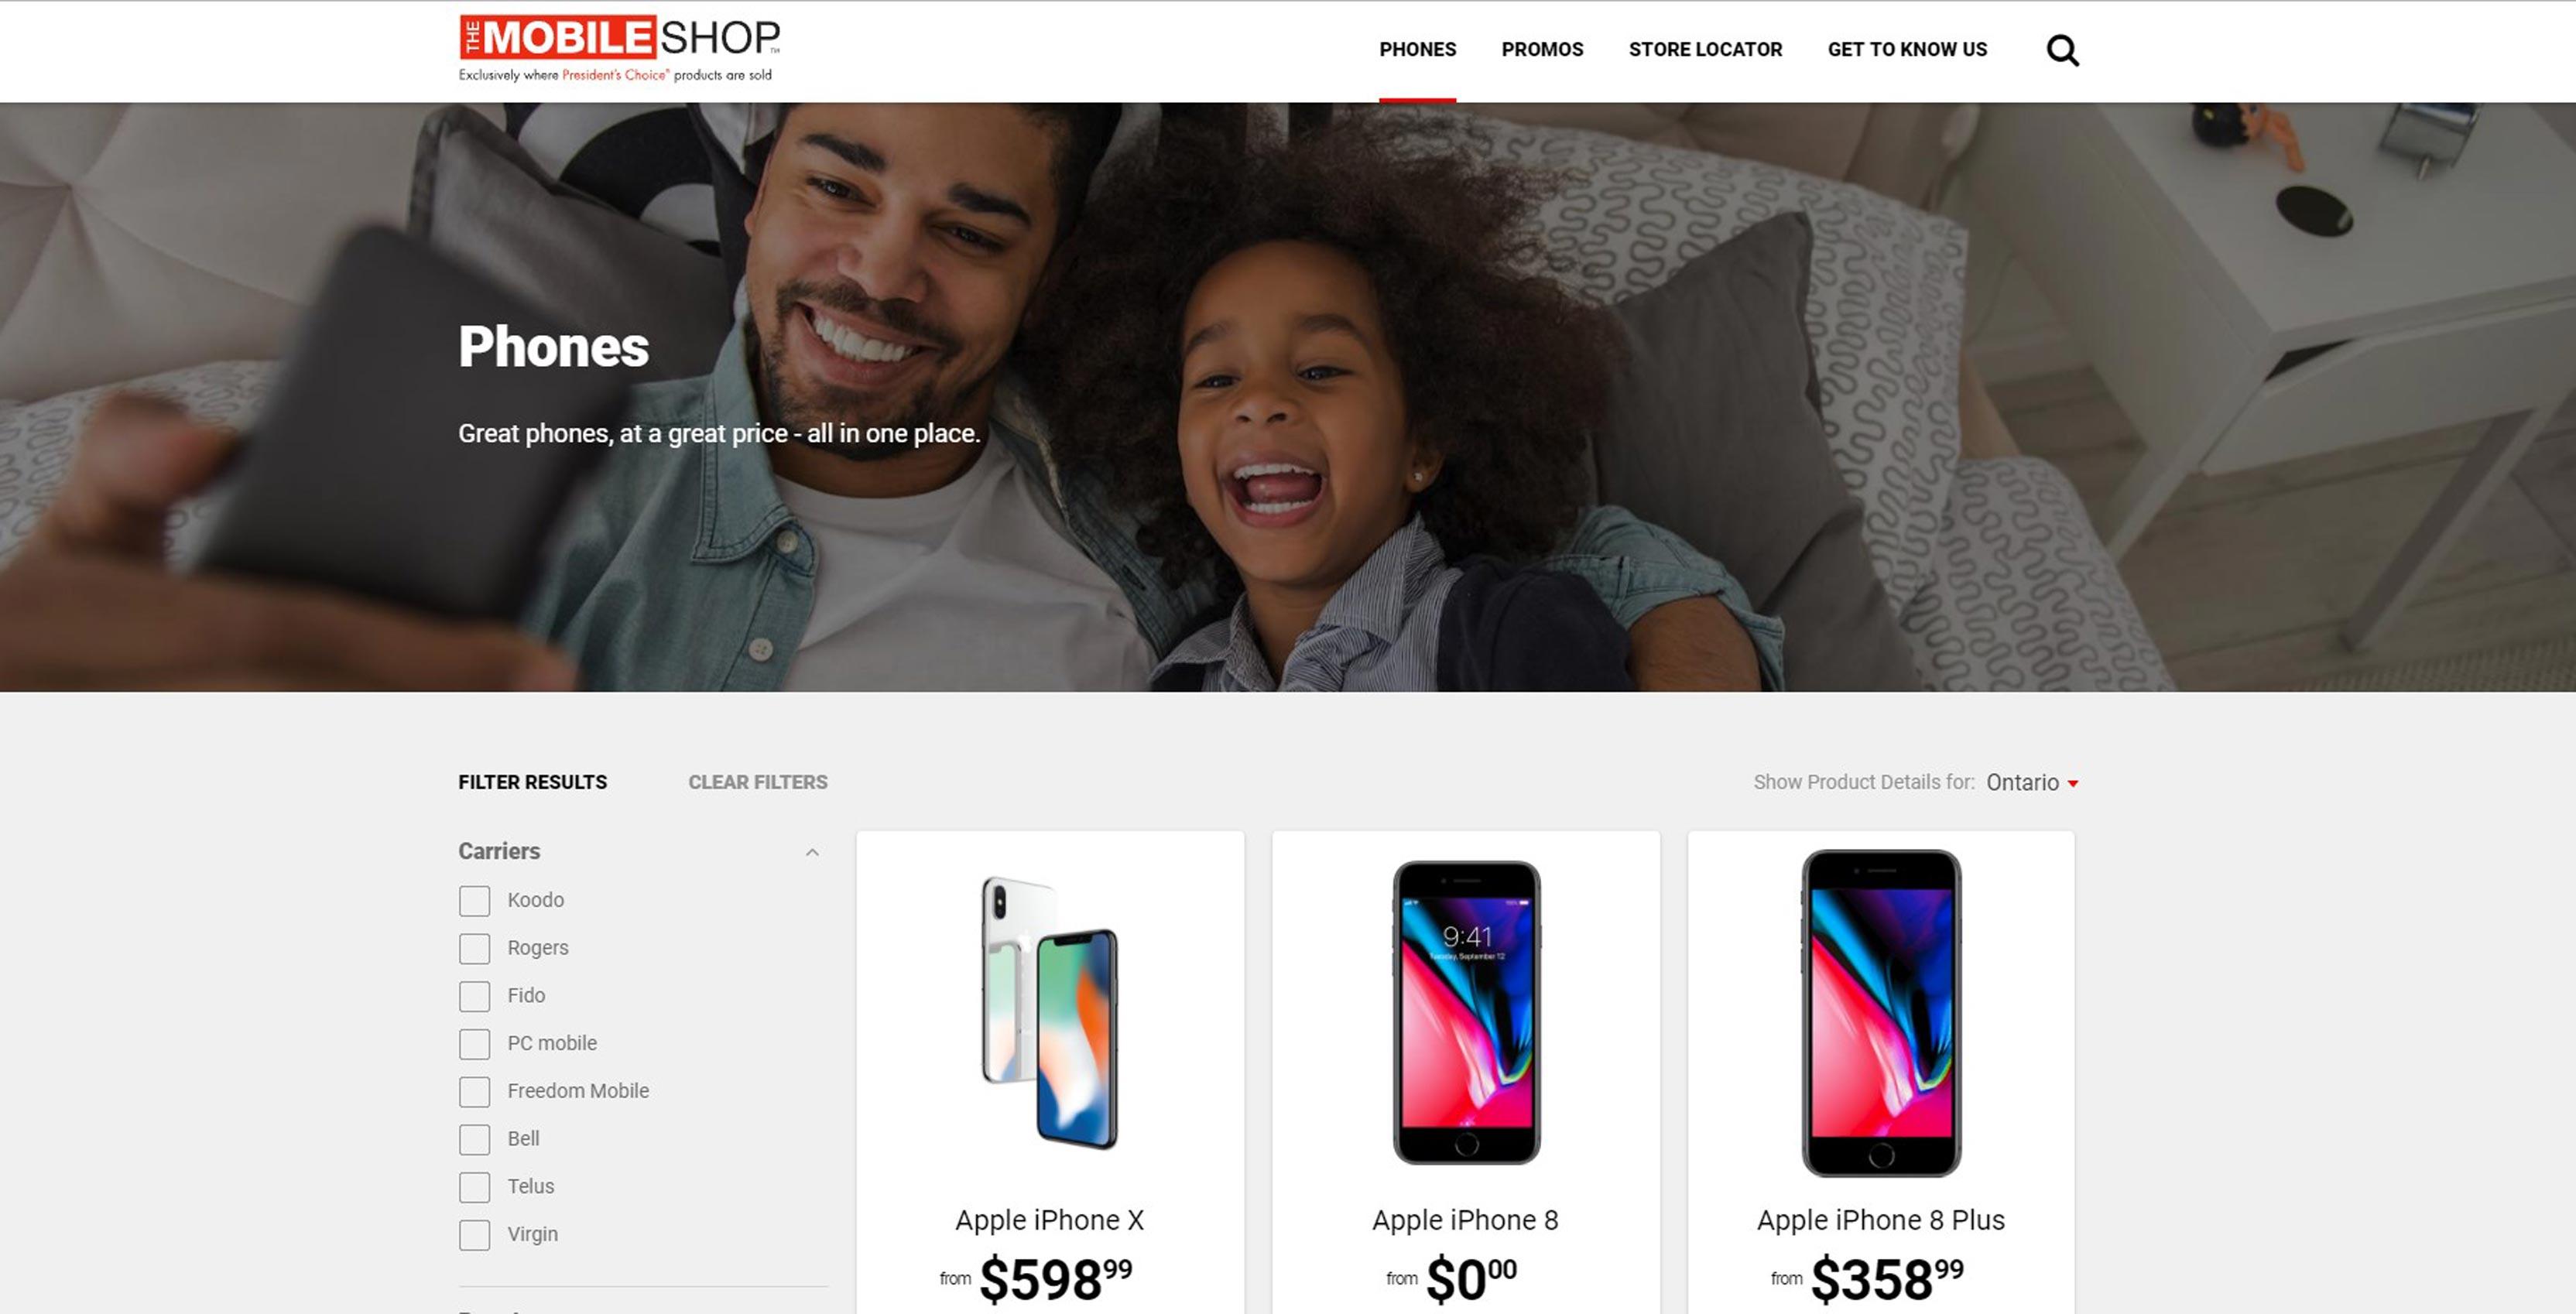 The Mobile Shop website